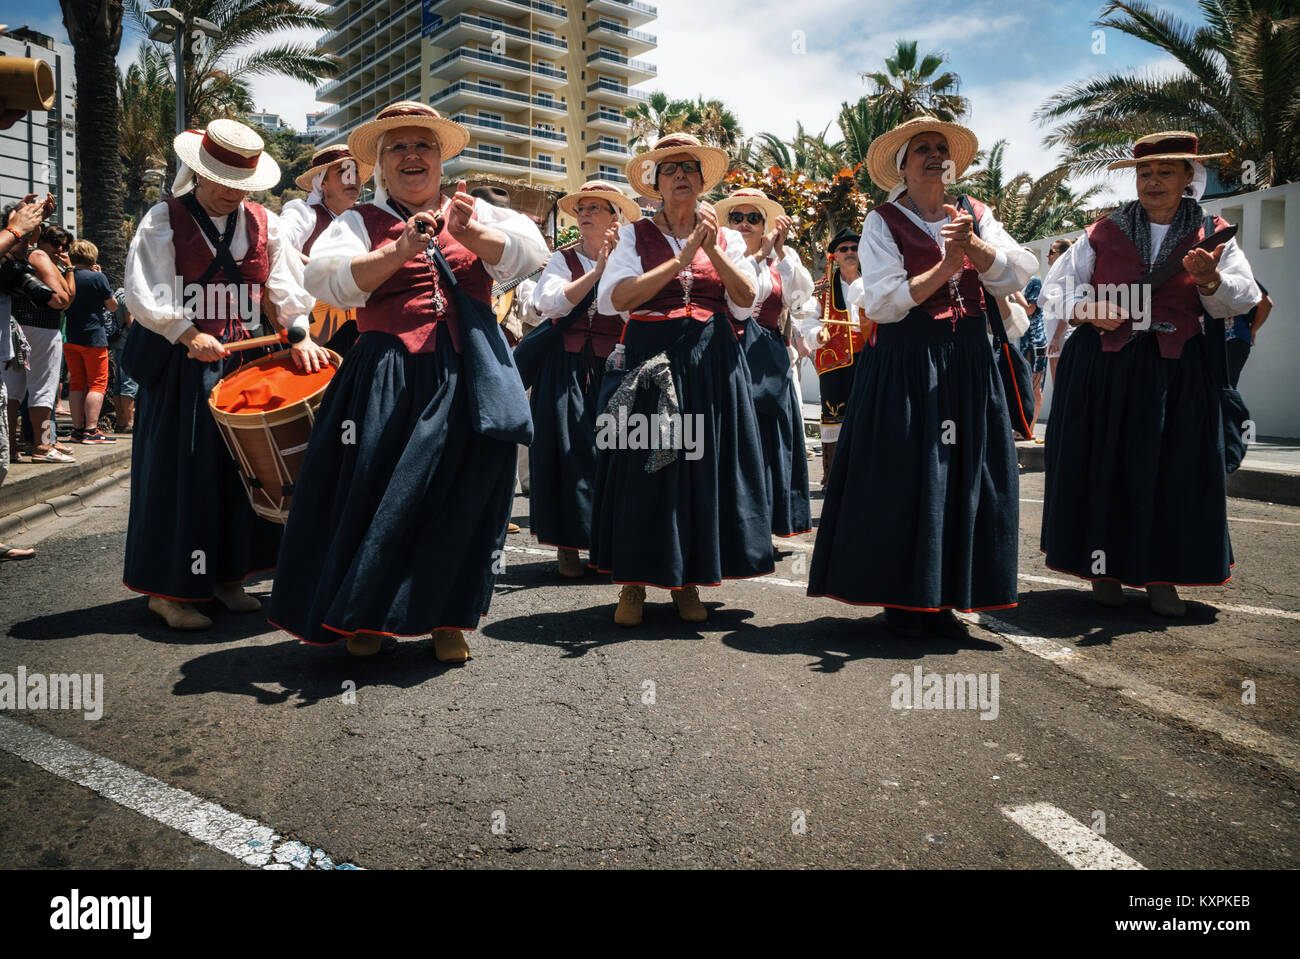 Puerto de la Cruz, Teneriffa, Kanarische Inseln - 30. Mai 2017: Kanaren Menschen in traditionellen Kleidern bekleidet Stockfoto